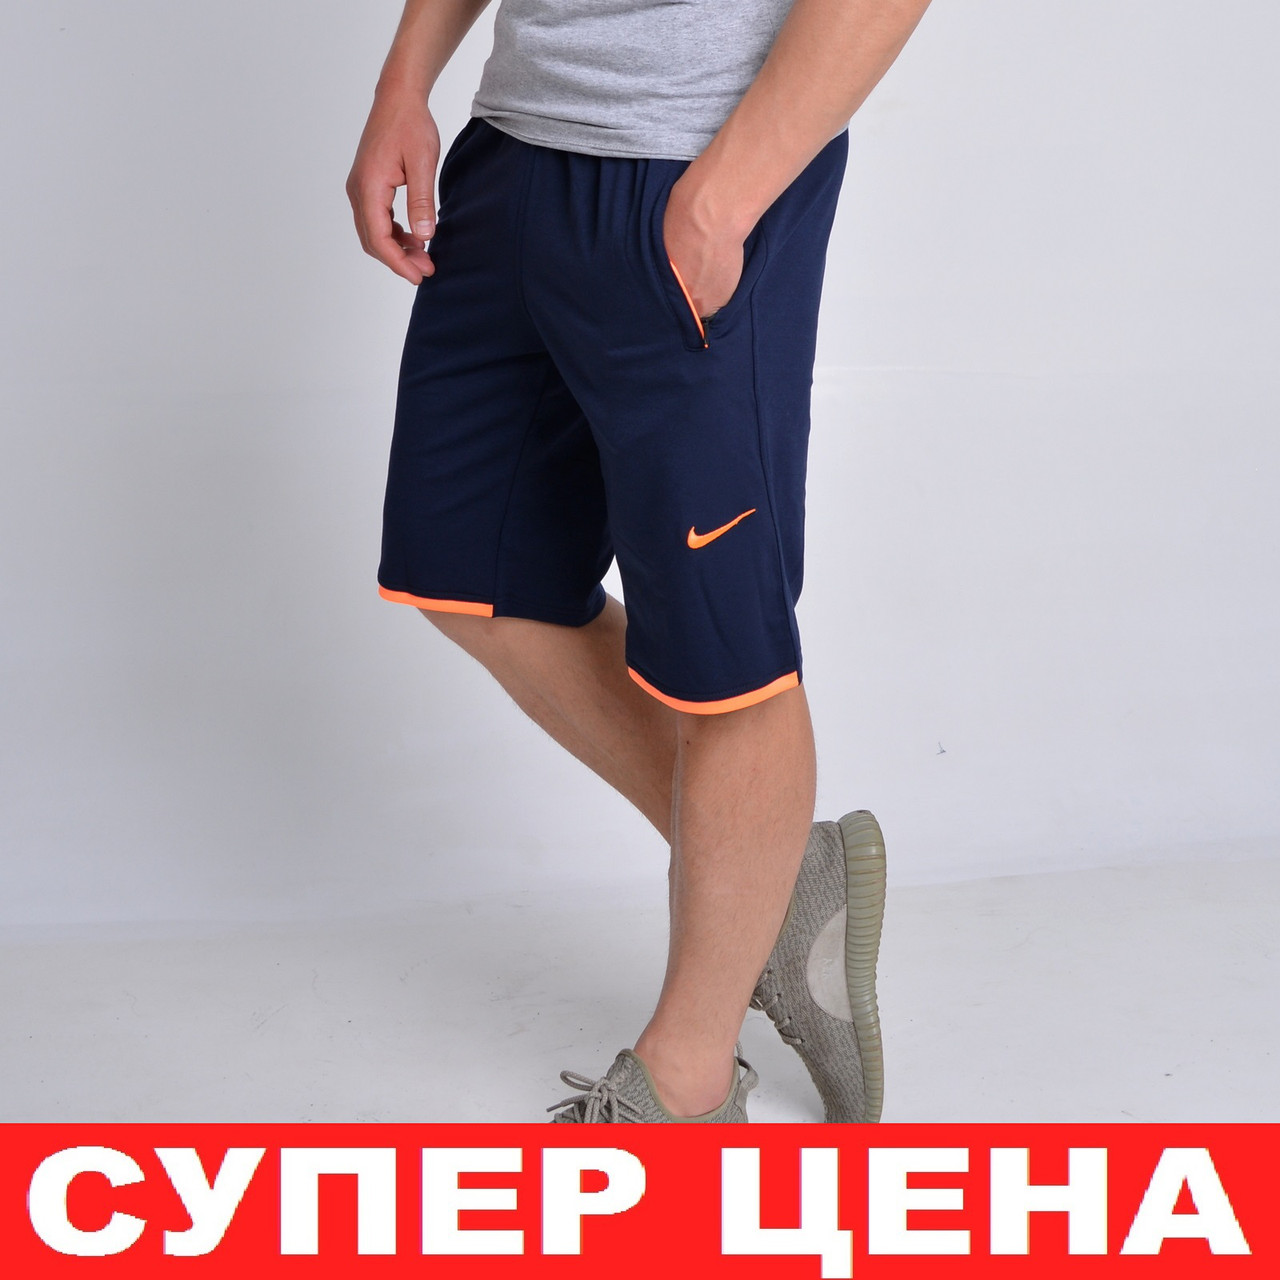 d7242d55 Размеры:46,48. Мужские шорты Nike (найк) | Турция, Трикотаж ...